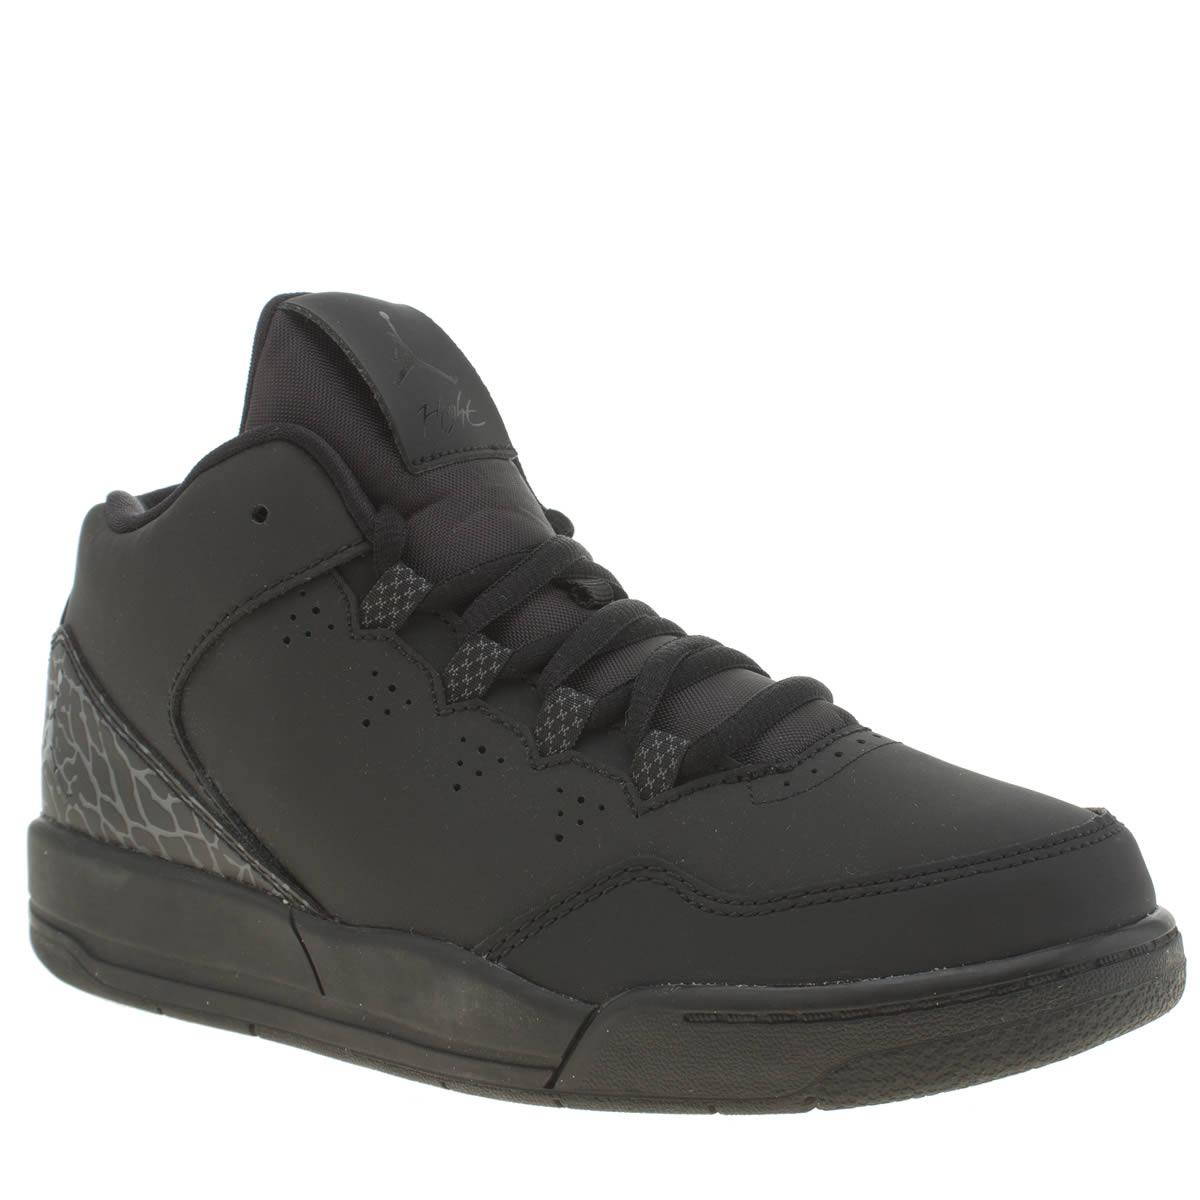 nike jordan Nike Jordan Black Flight Origin Unisex Junior